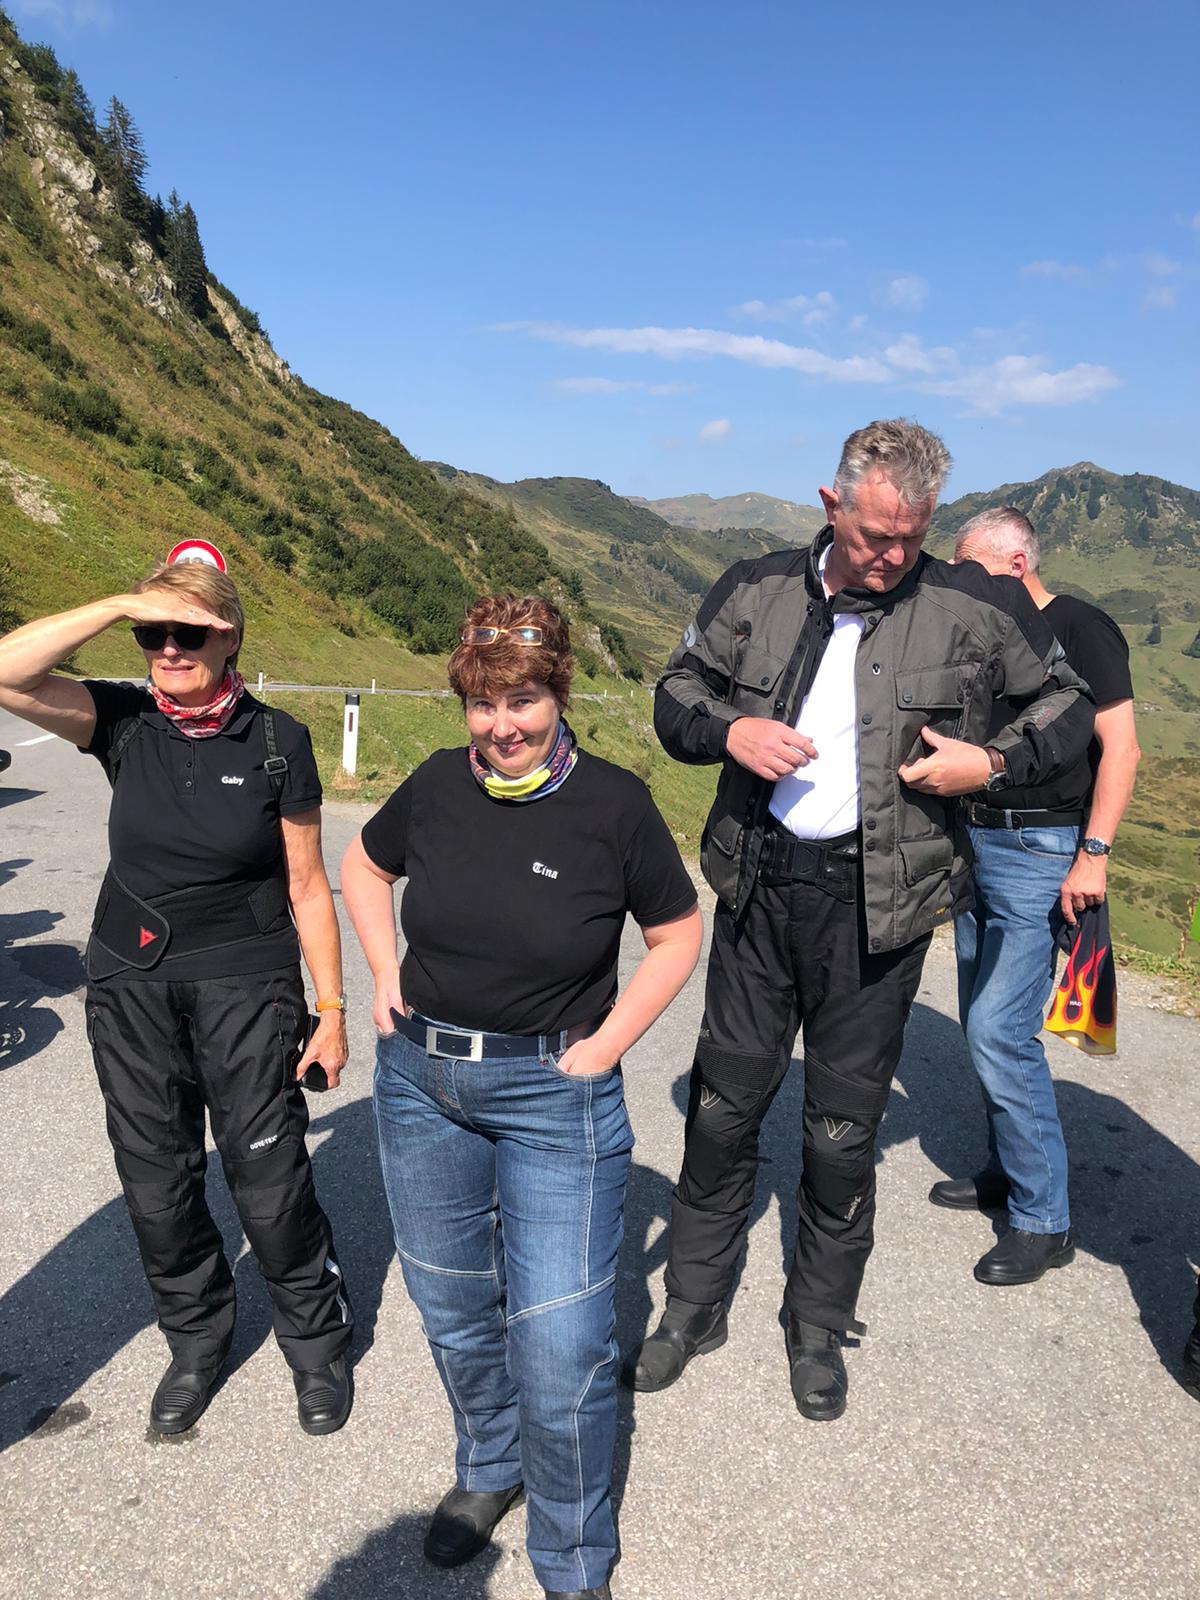 Gaby, Betina, Jo und verdeckt Bernd.